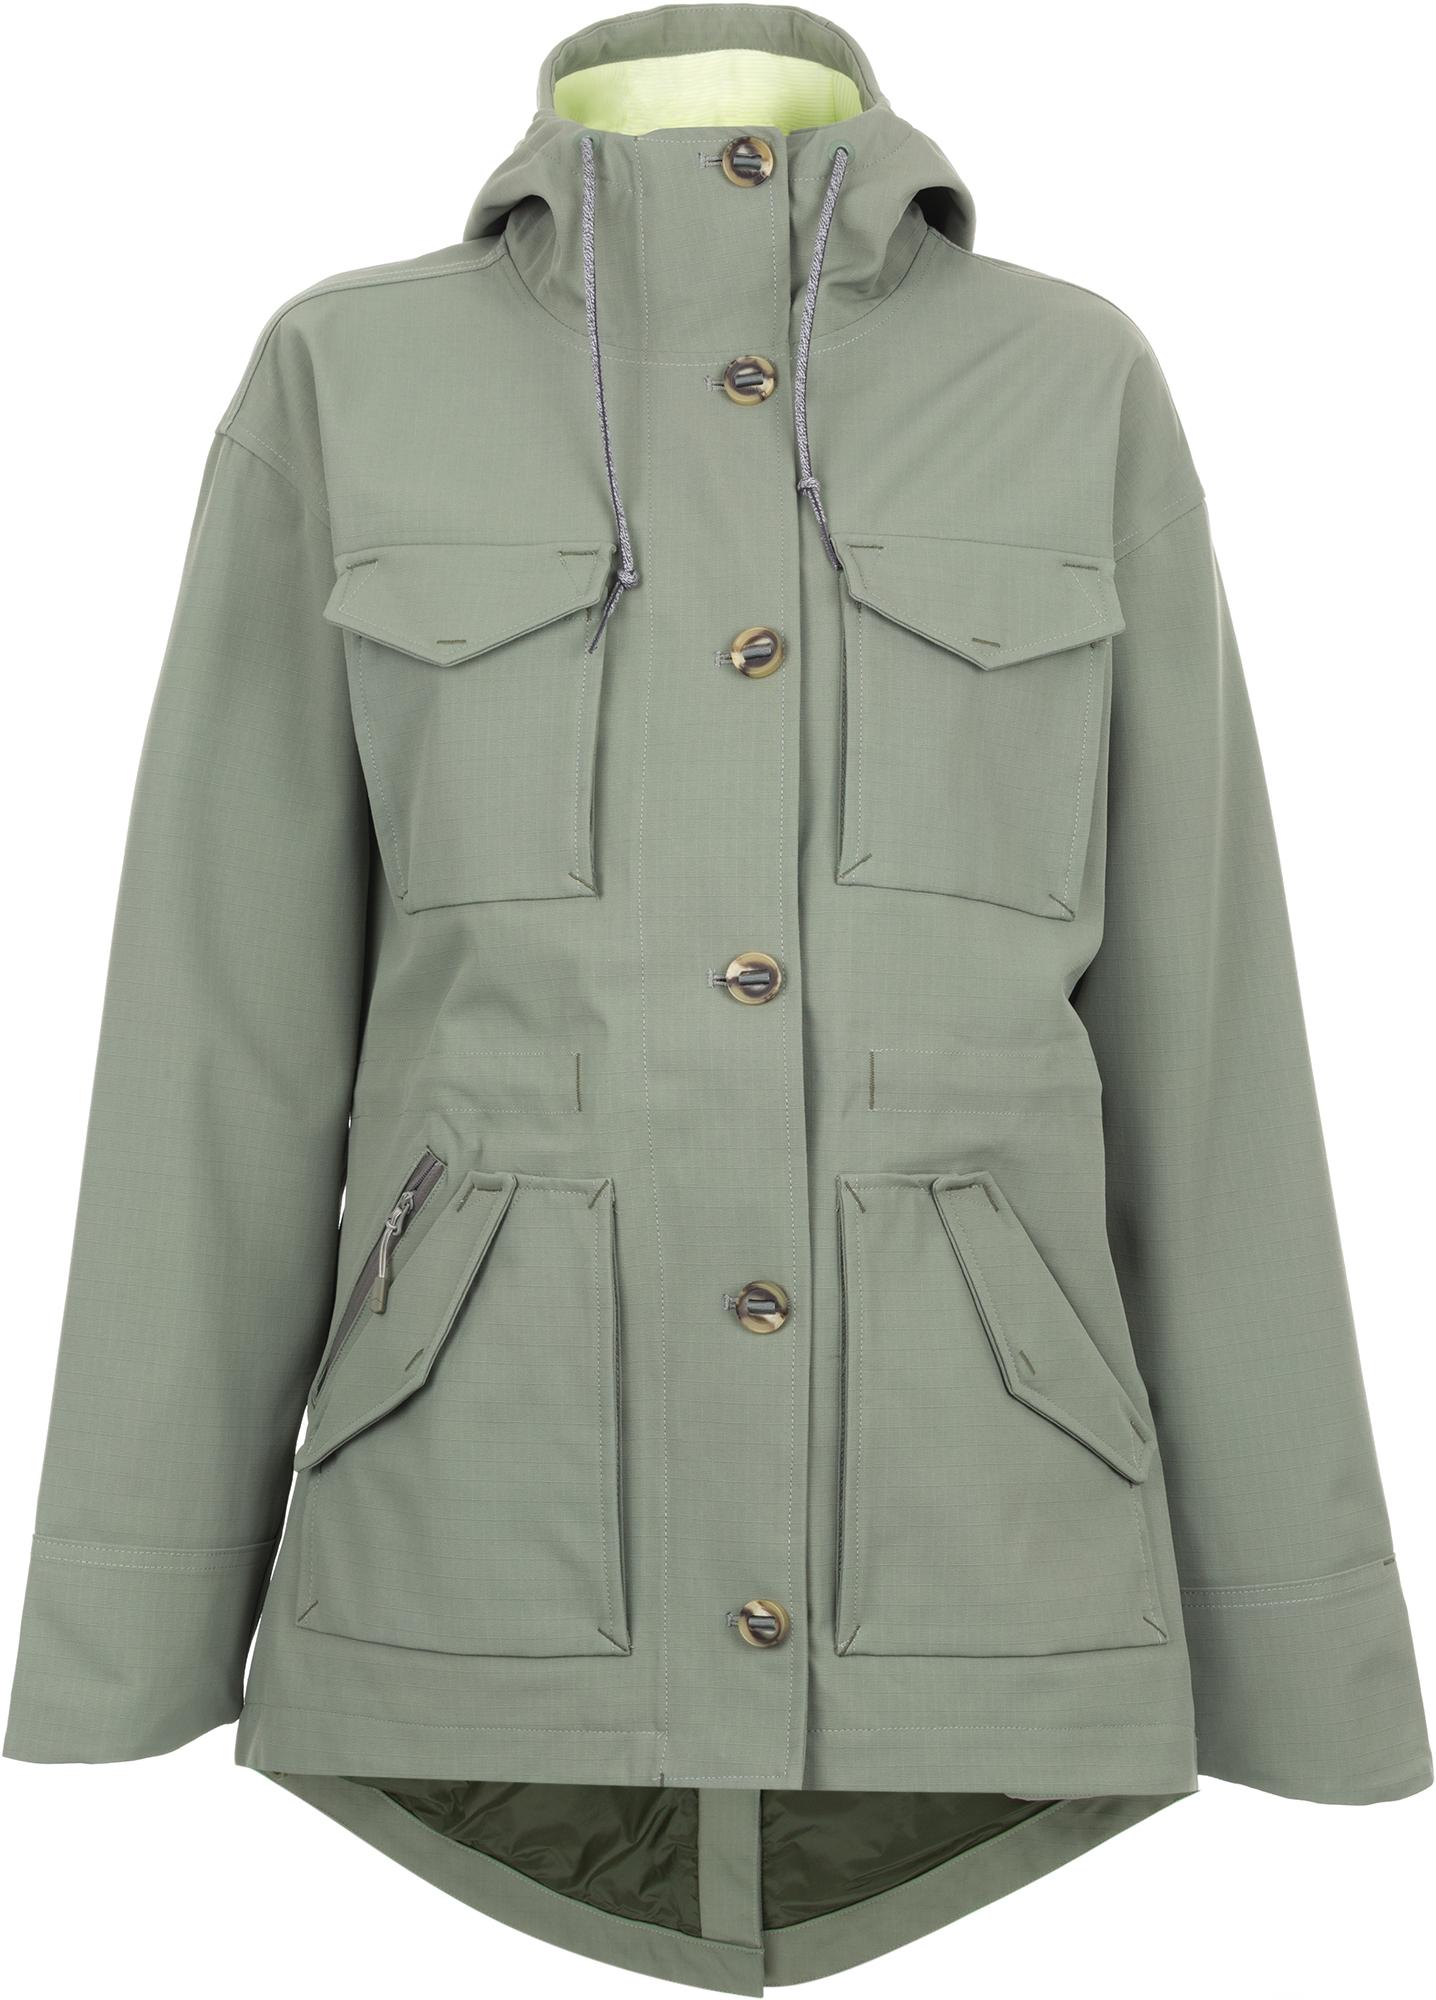 цена на Mountain Hardwear Ветровка женская Mountain Hardwear Overlook, размер 46